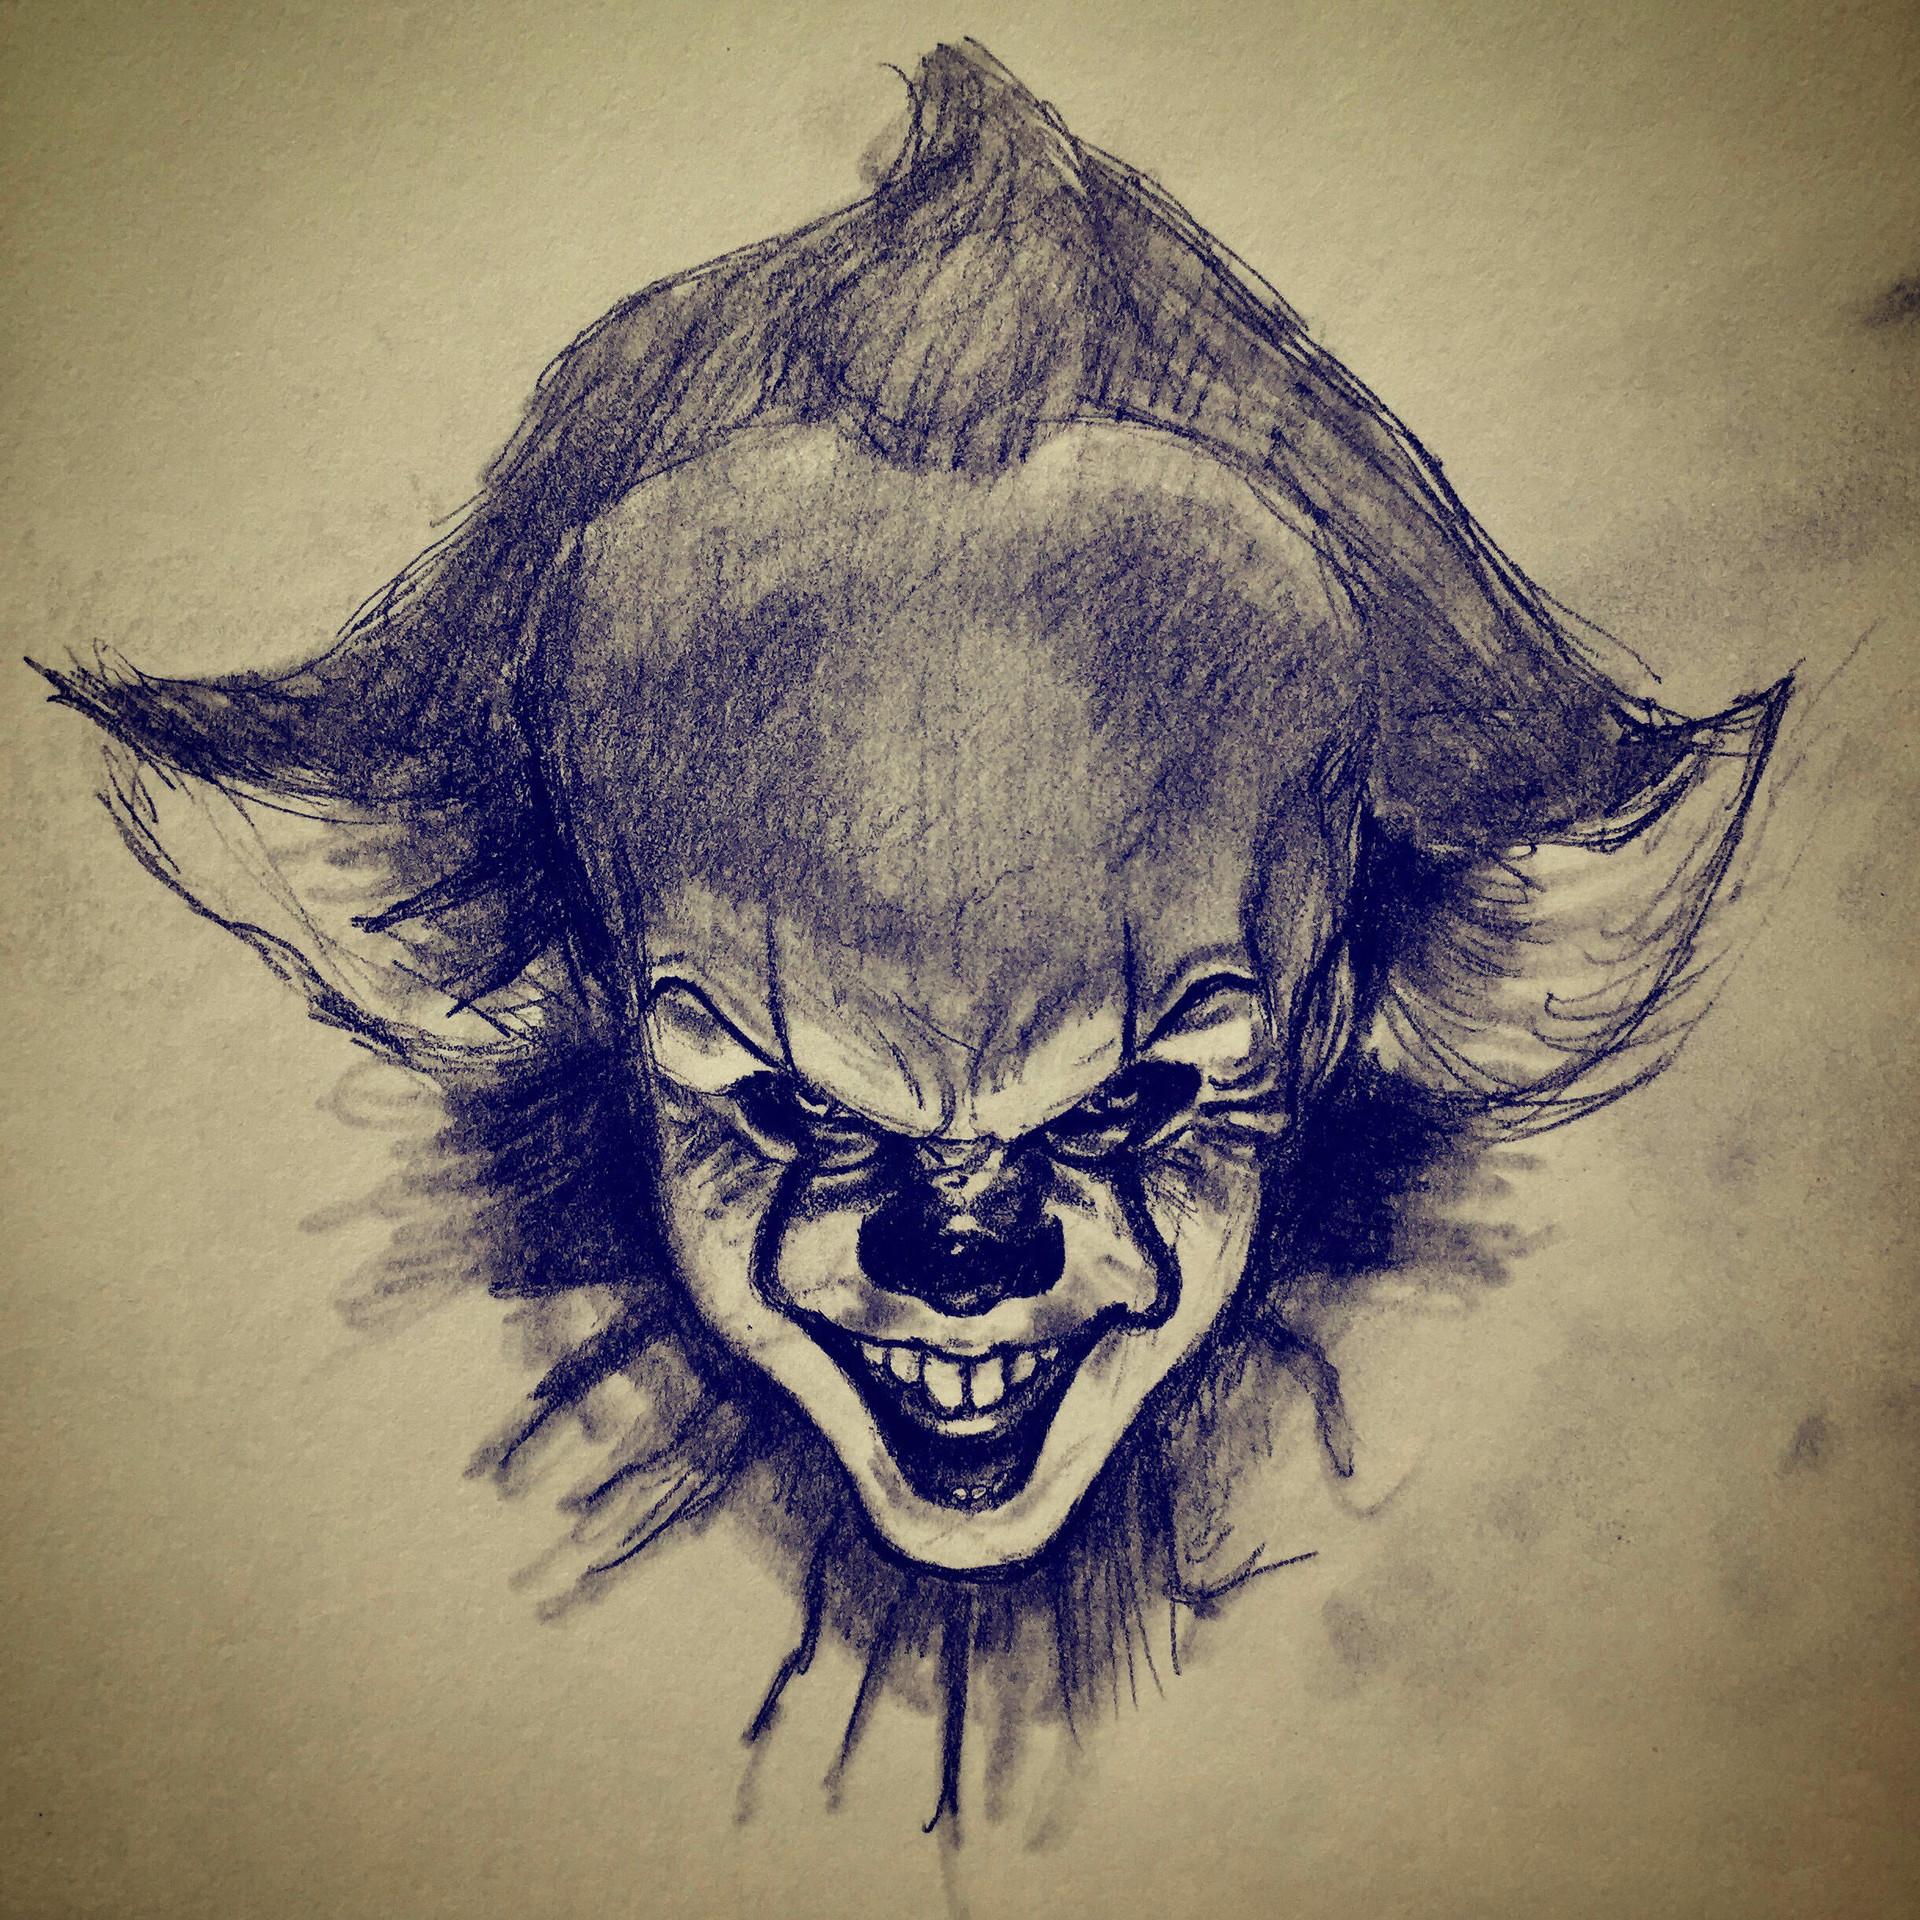 snls birthday clown sketch - HD1920×1920